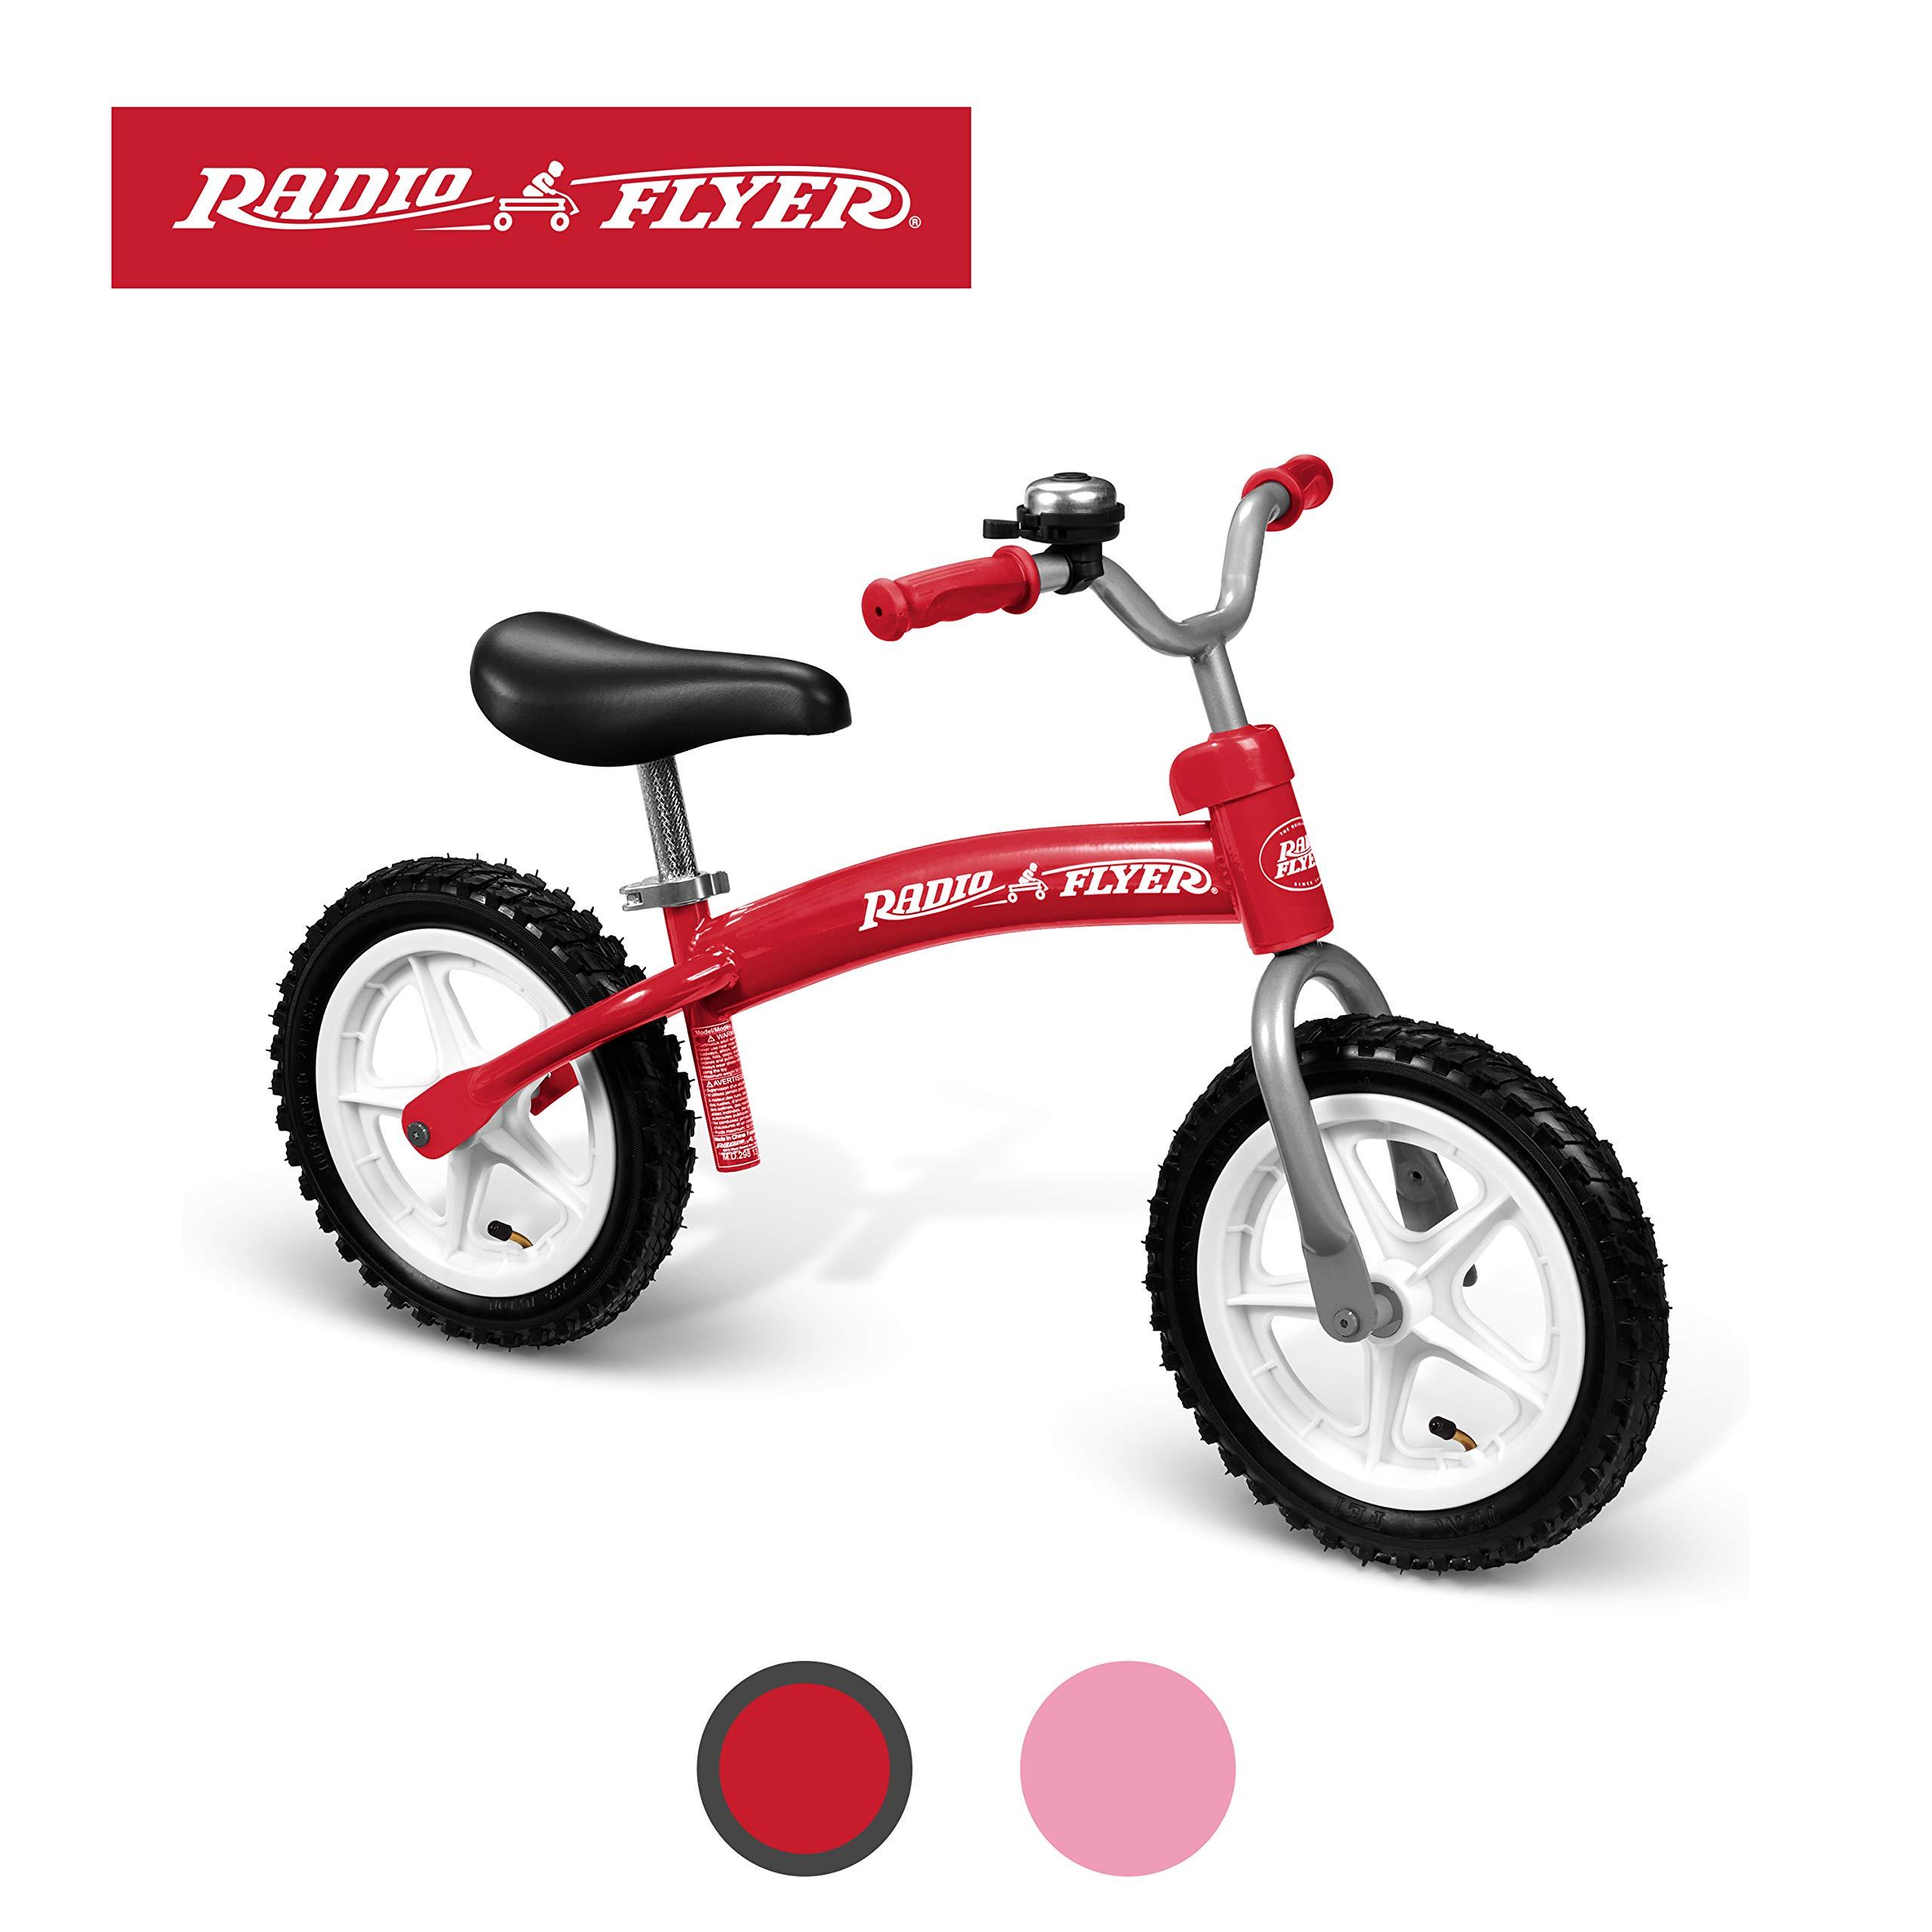 Radio Flyer All-Terrain Balance Bike by Radio Flyer